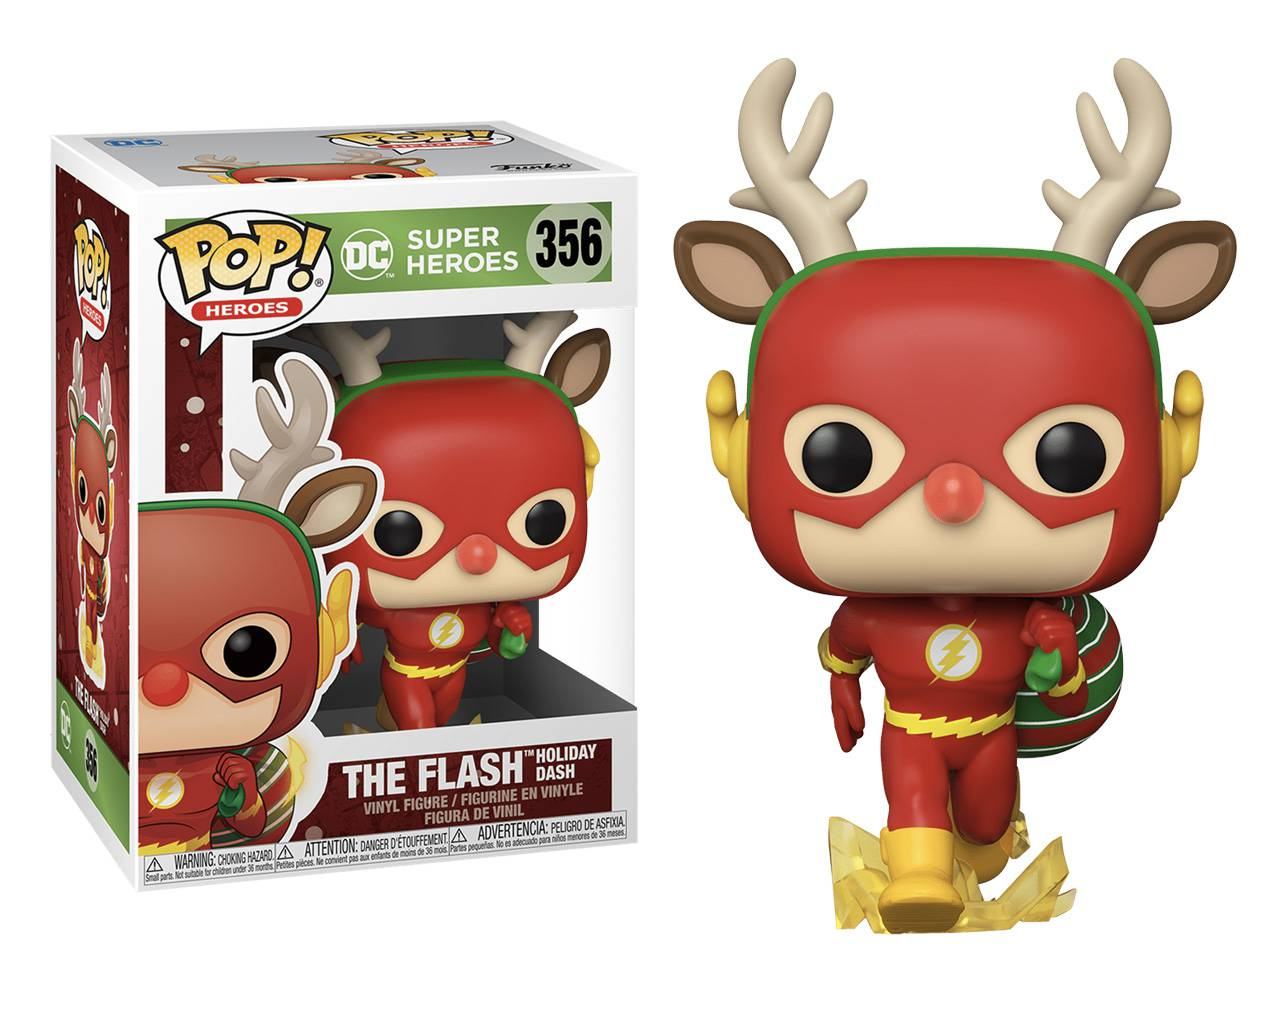 The Flash (Holiday Dash) Pop! Vinyl